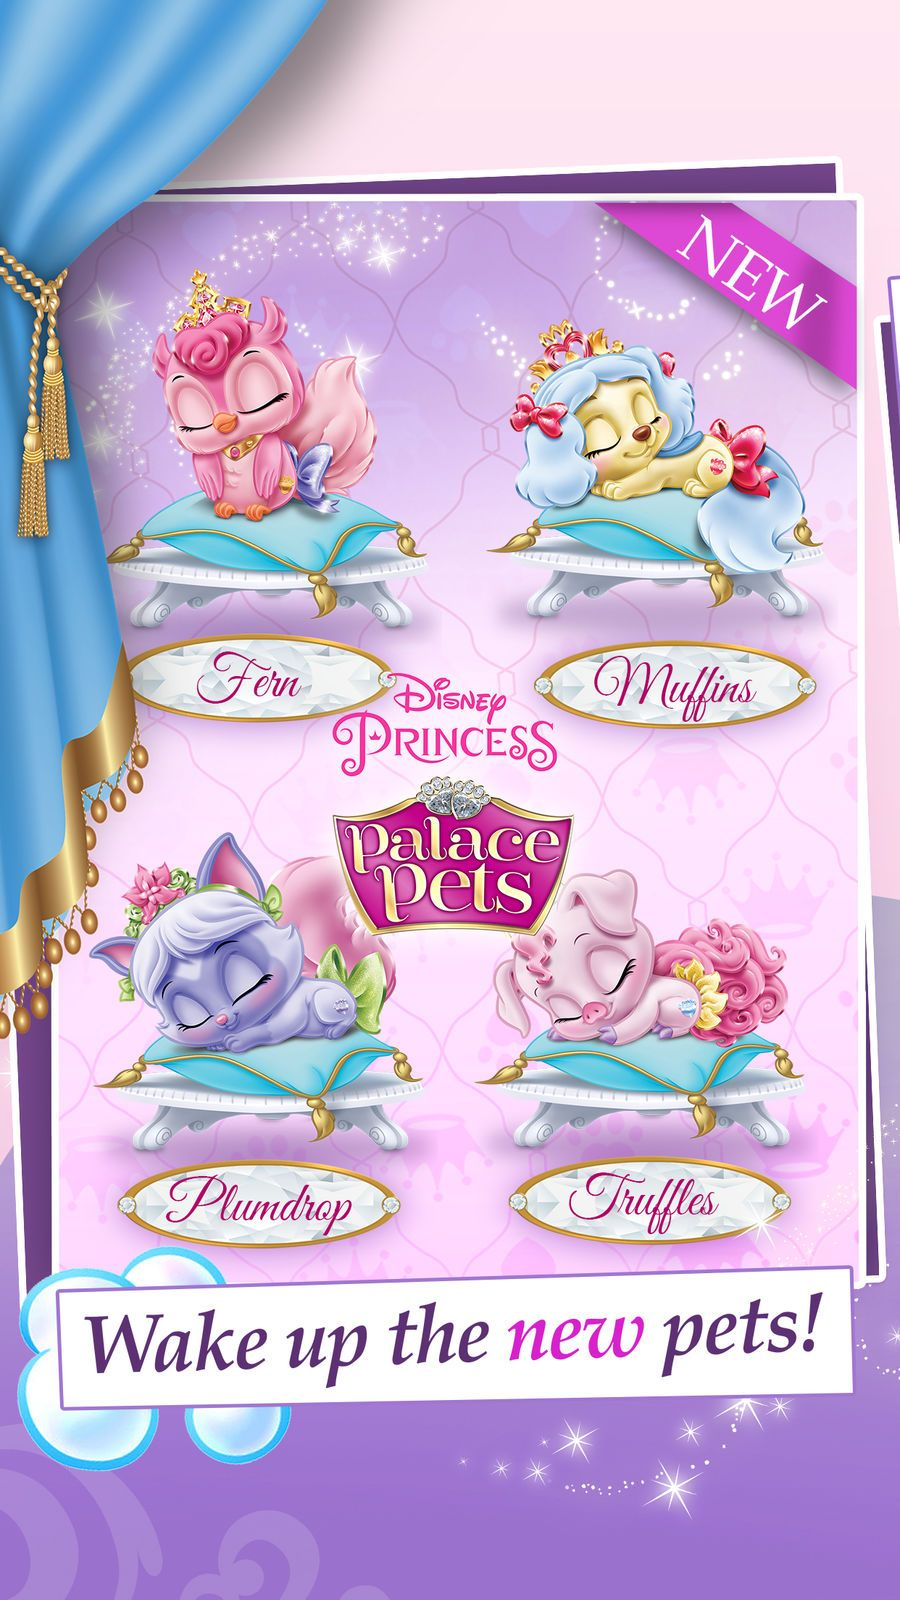 Disney Princess Palace Pets Books Entertainment Apps Ios Princess Palace Pets Disney Princess Palace Pets Palace Pets